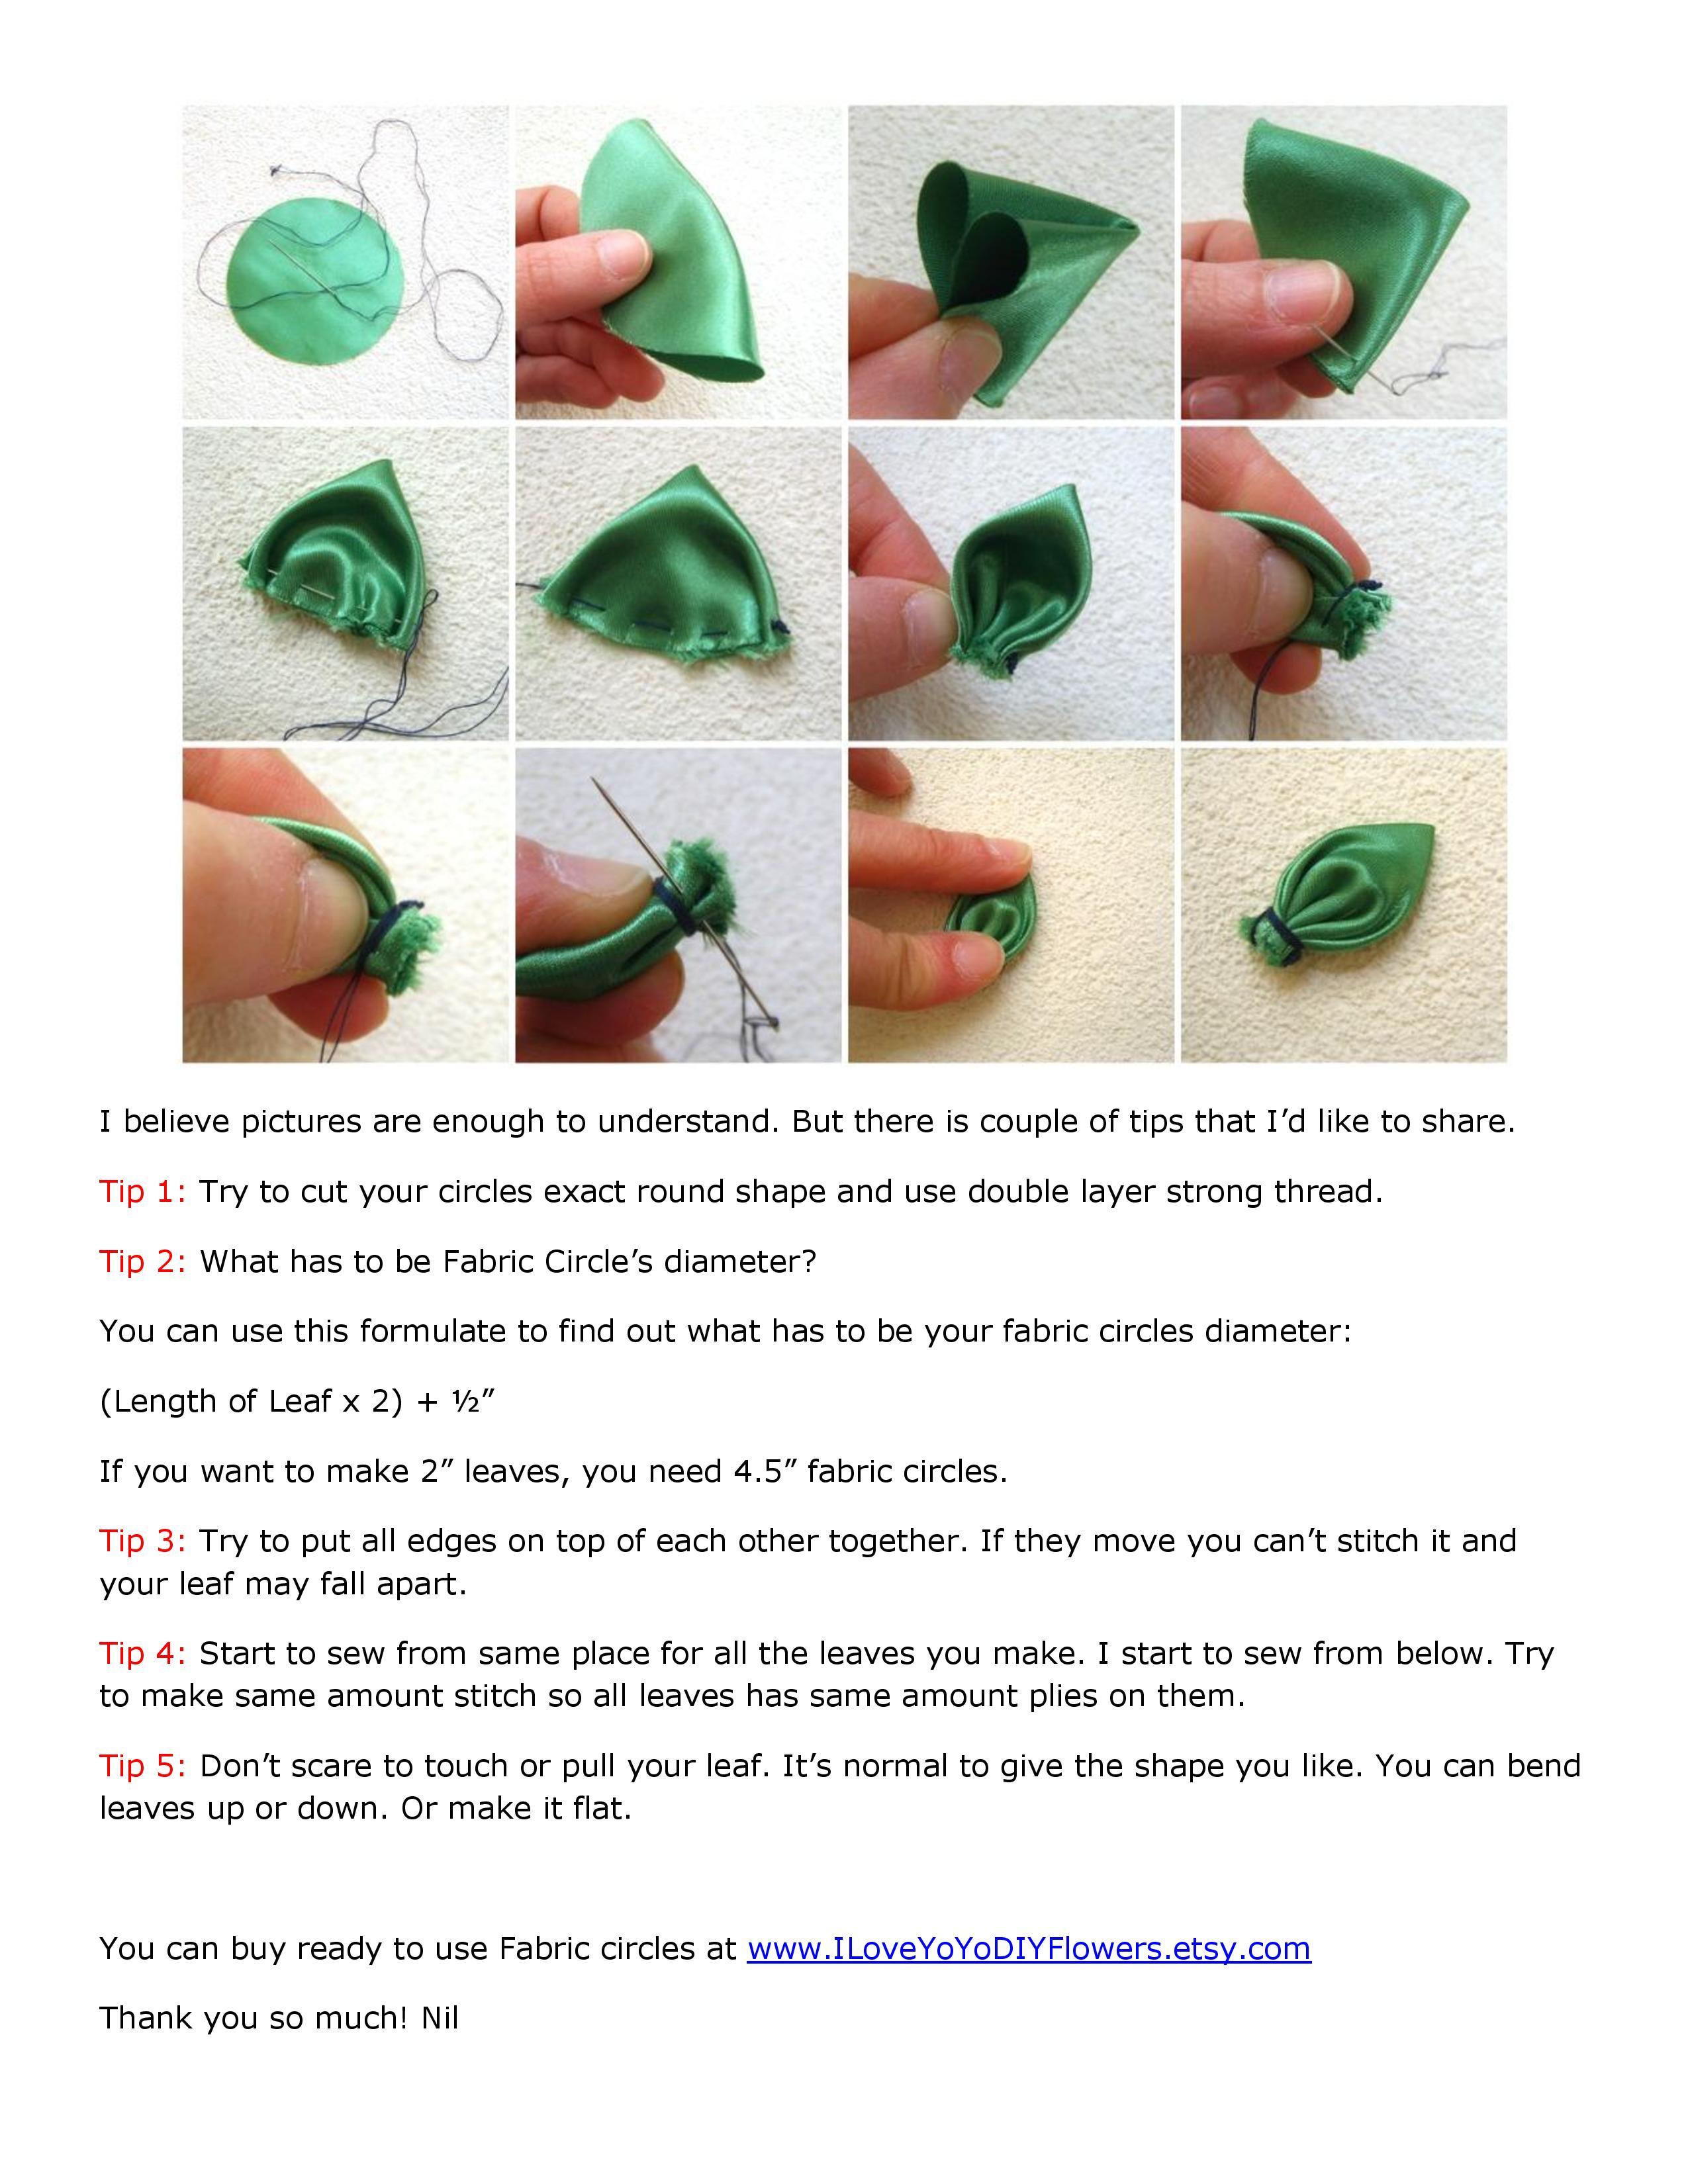 leaf-tutorial-pdf-page-001.jpg